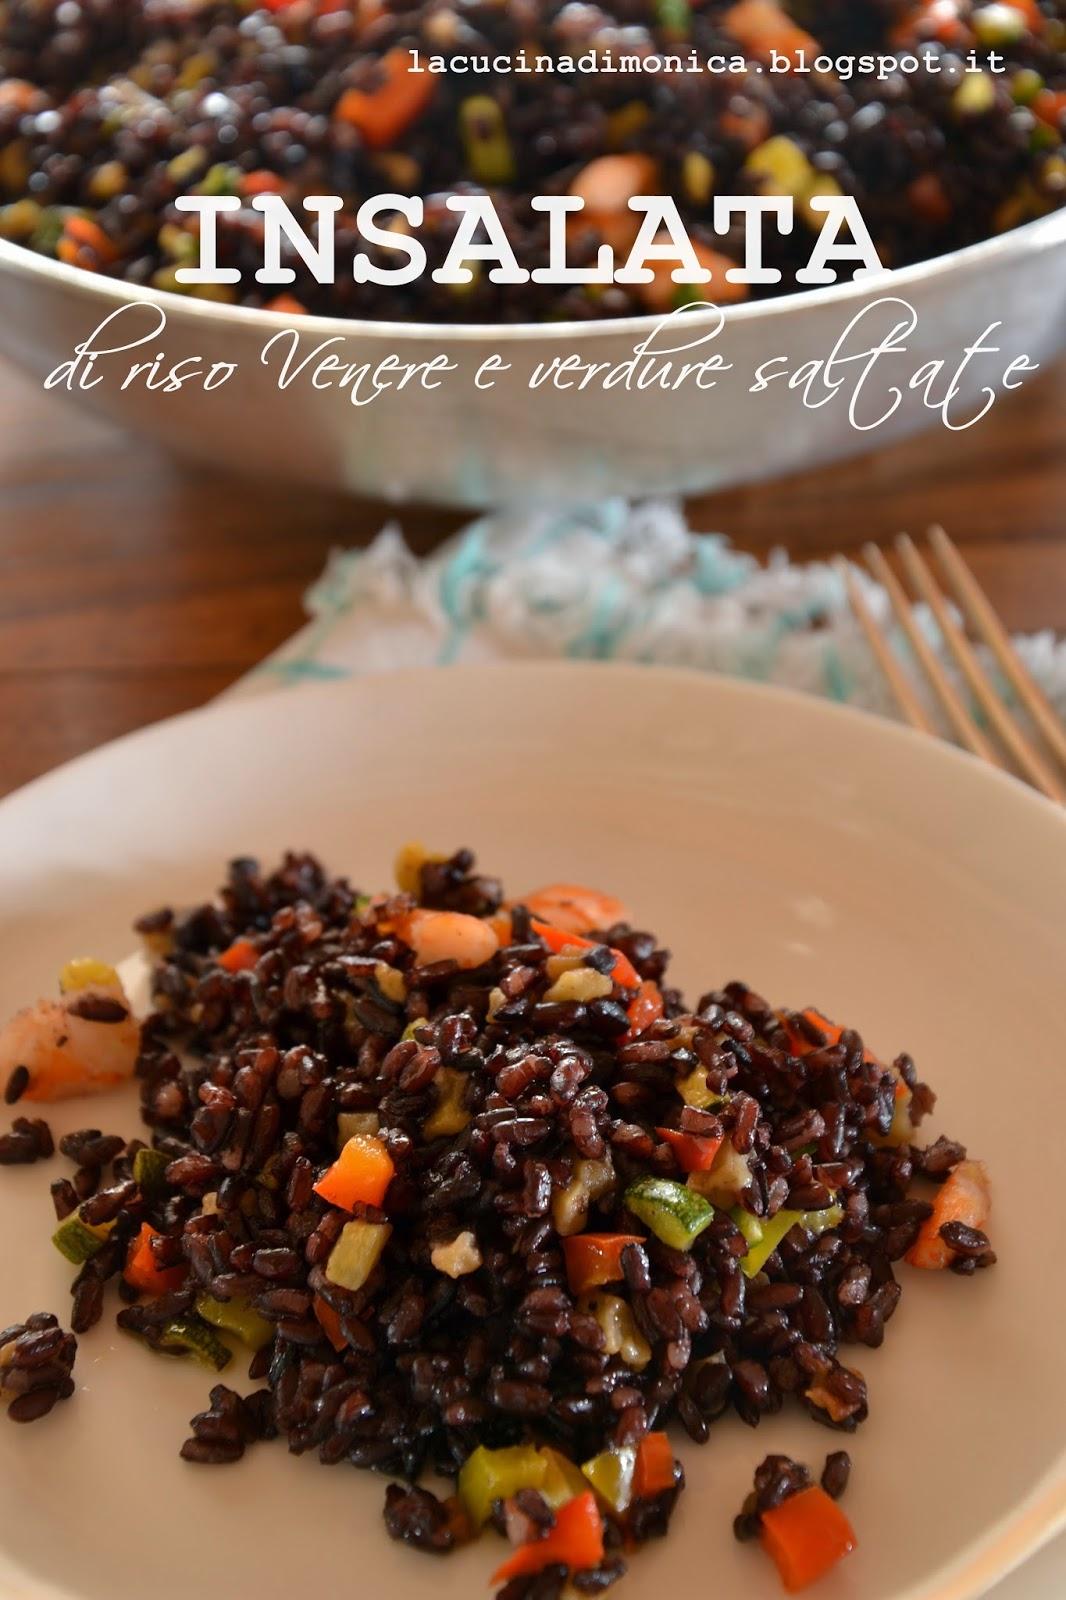 insalata di riso venere e verdure saltate